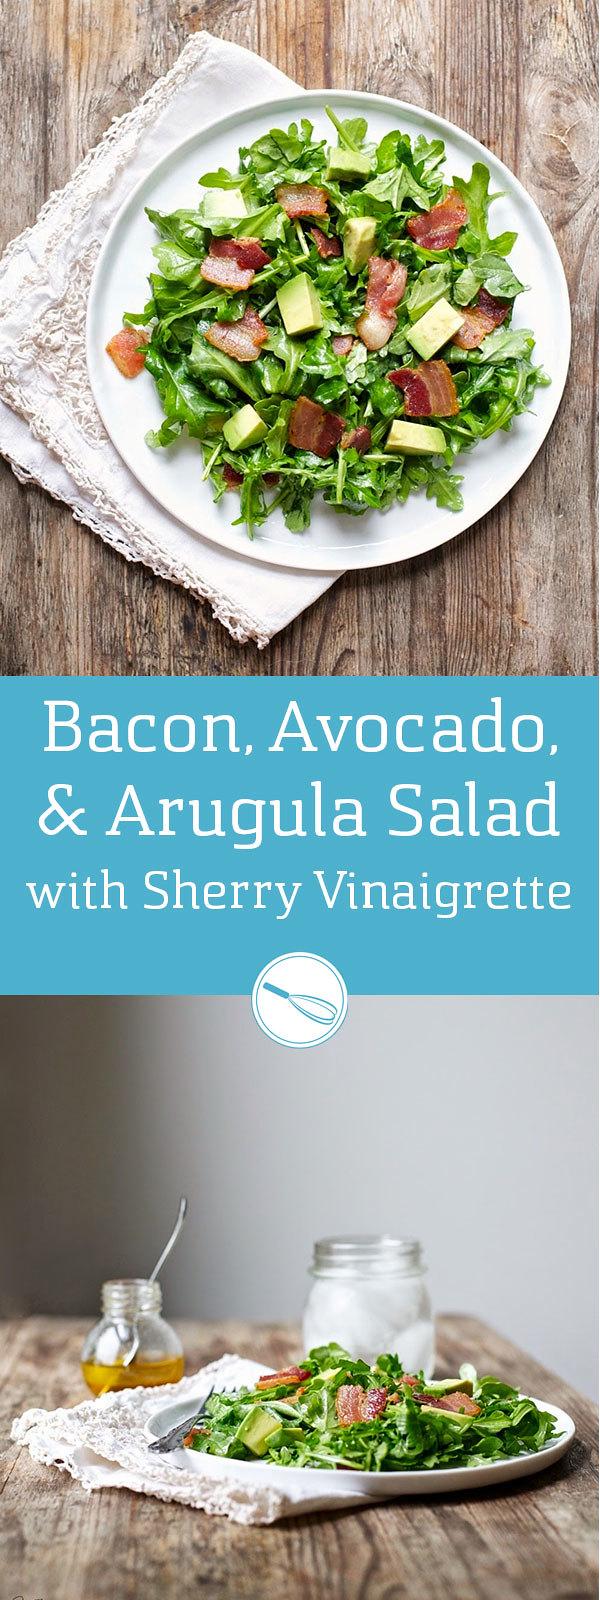 Bacon, Avocado, & Arugula Salad (Gluten free, Paleo)